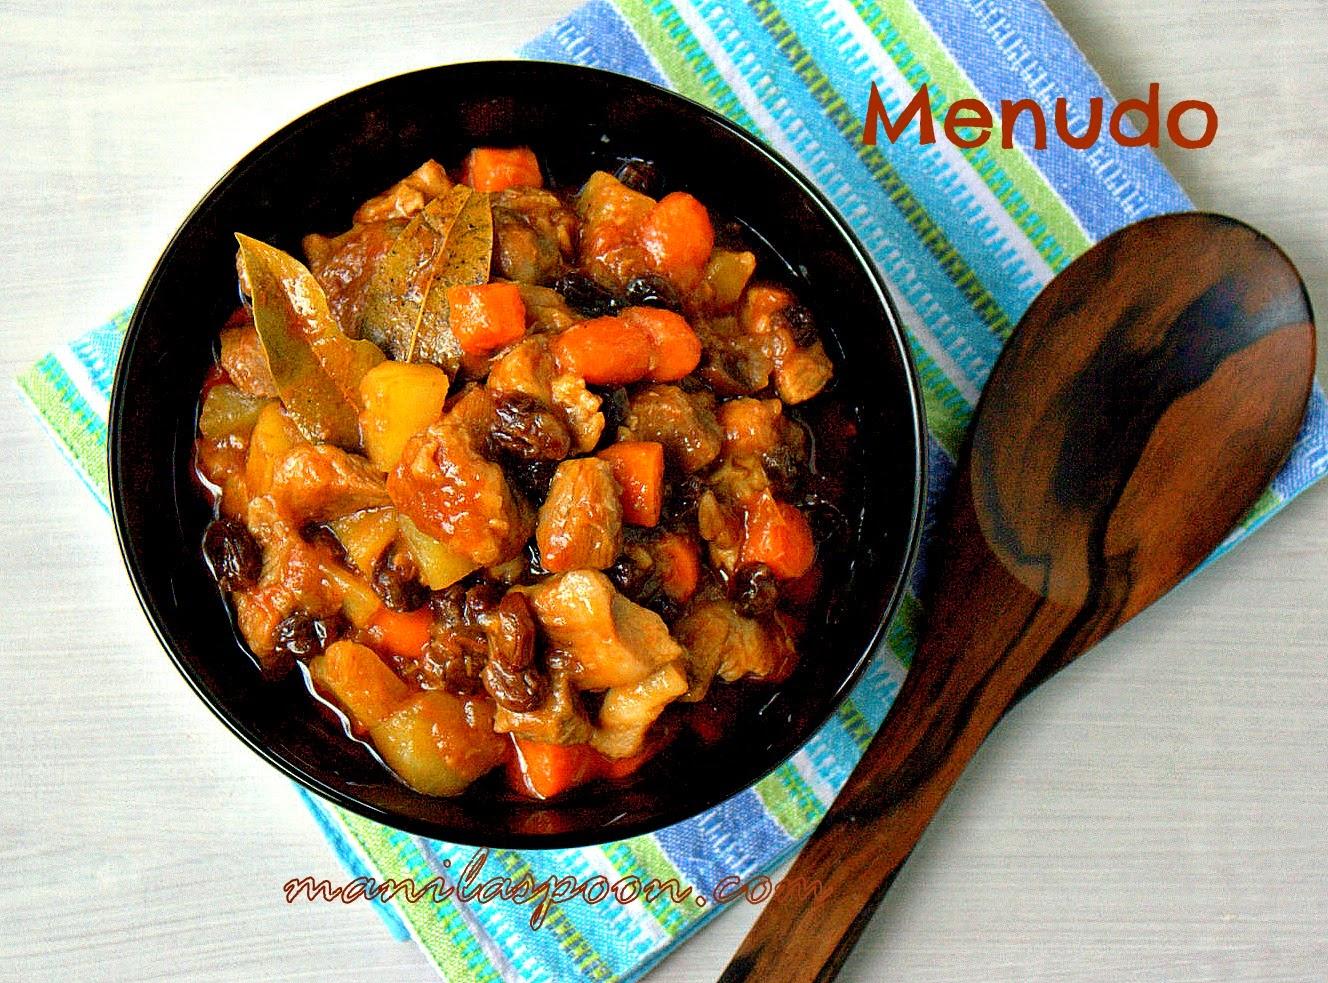 Pork or Beef Menudo